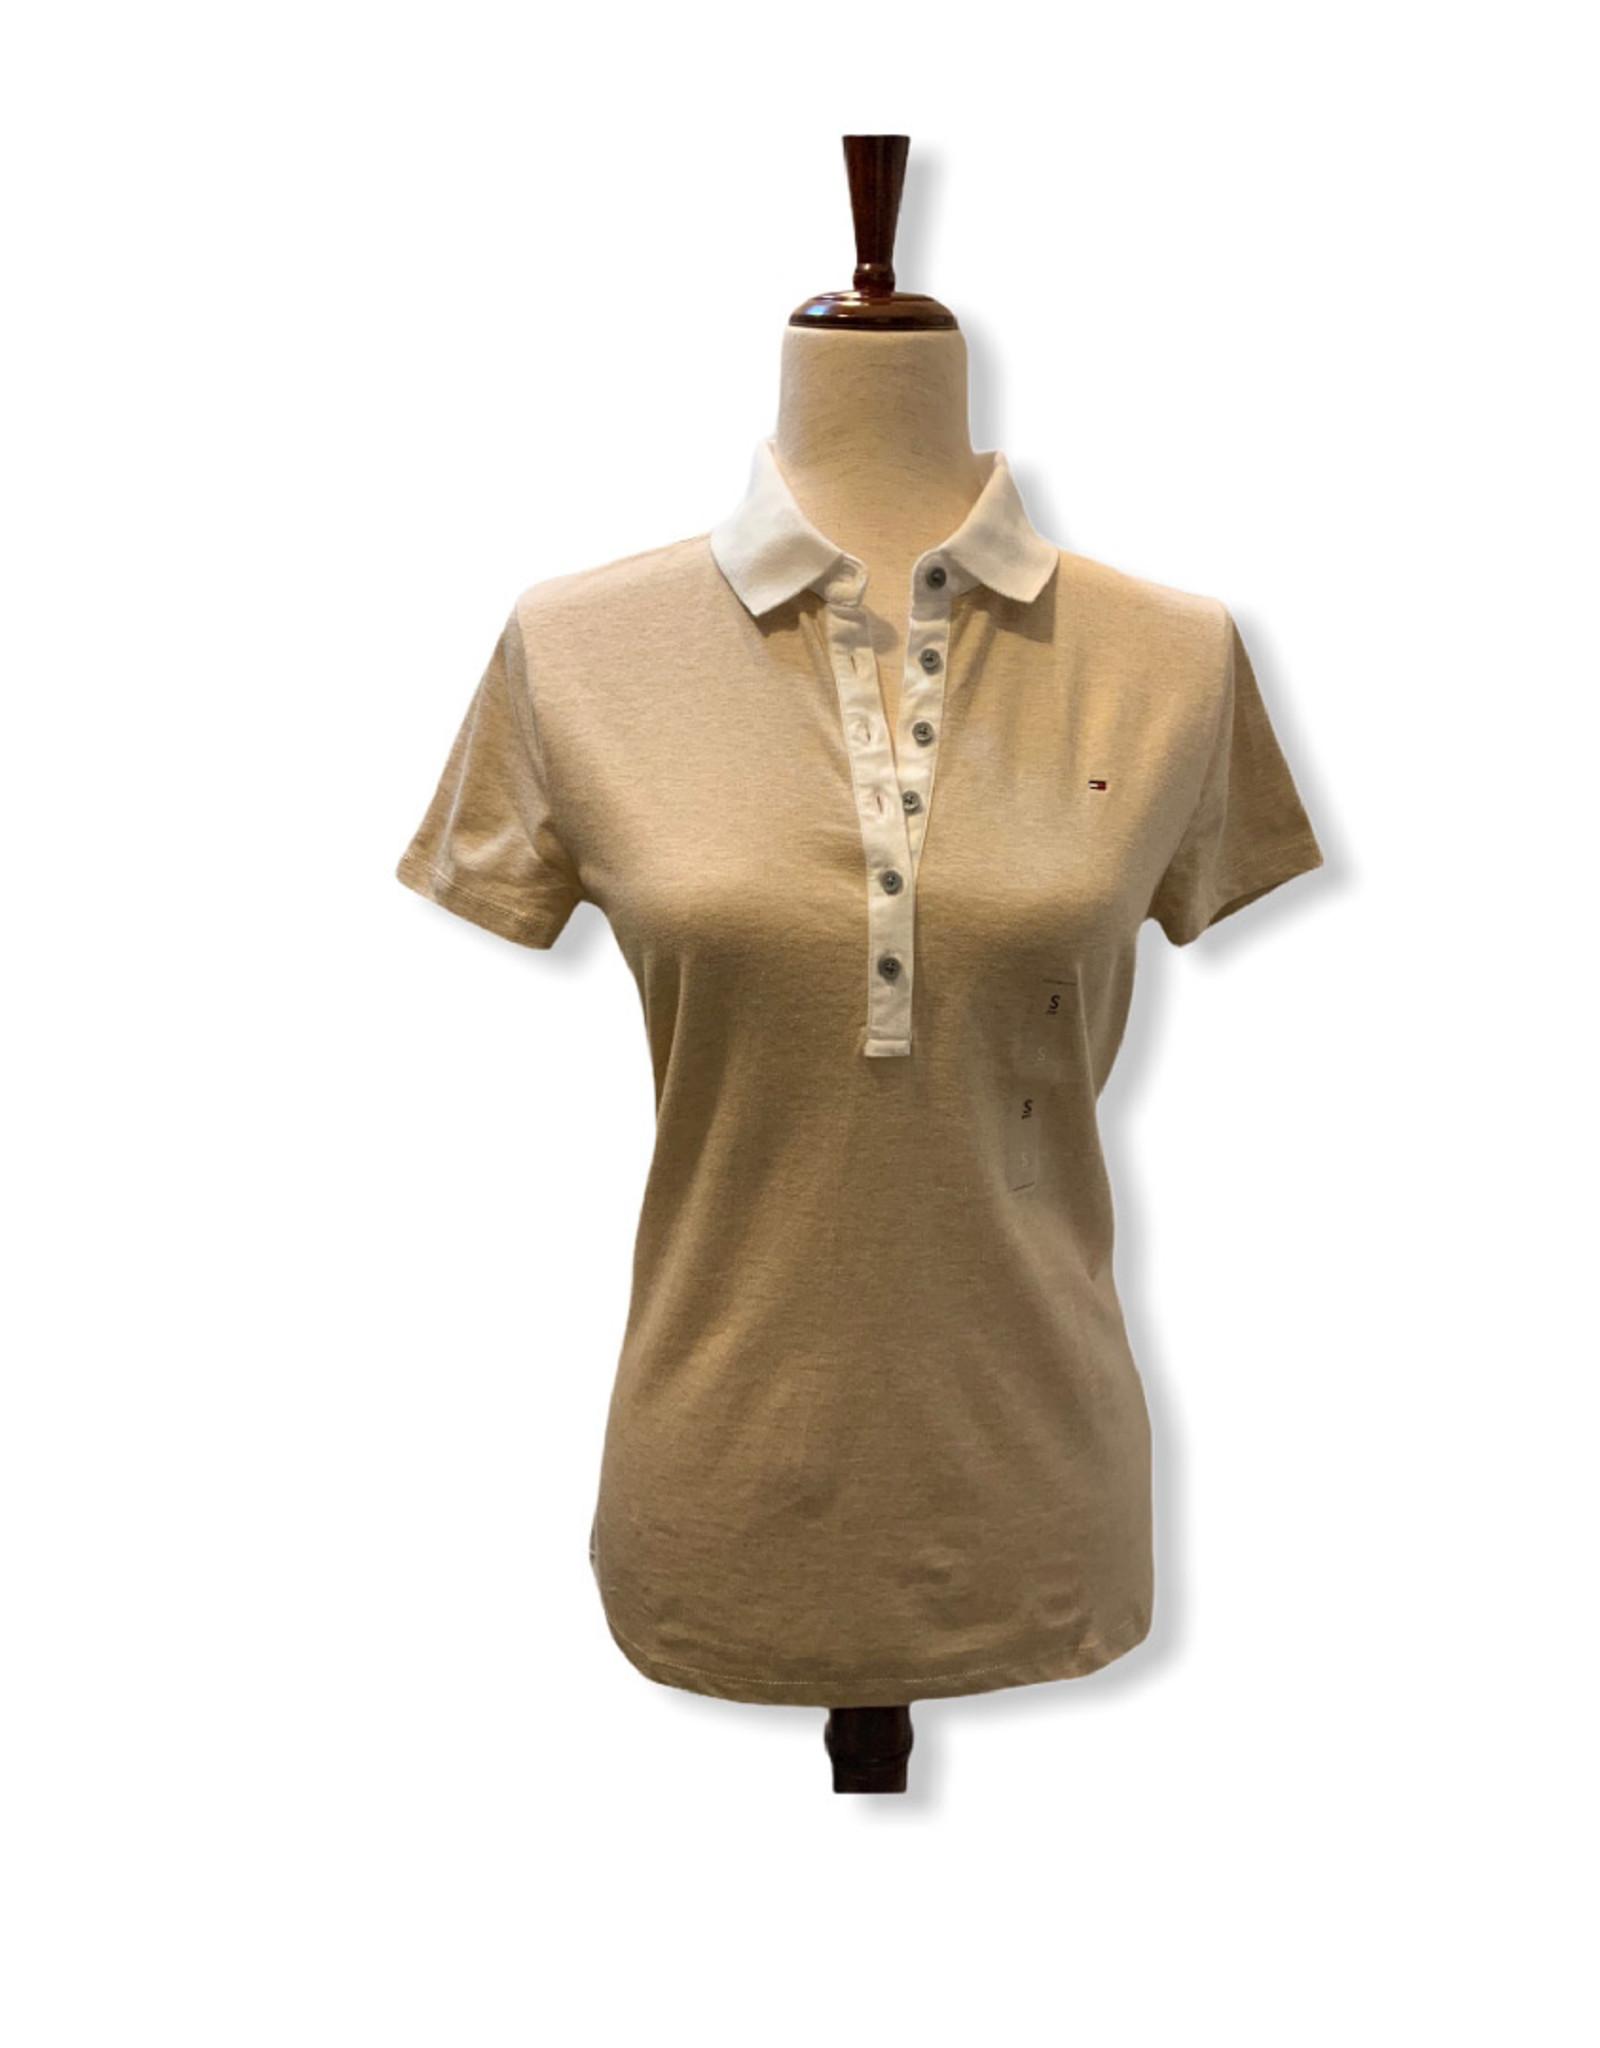 Tommy Hilfiger Tommy Hilfiger Polo Shirt Jersey June